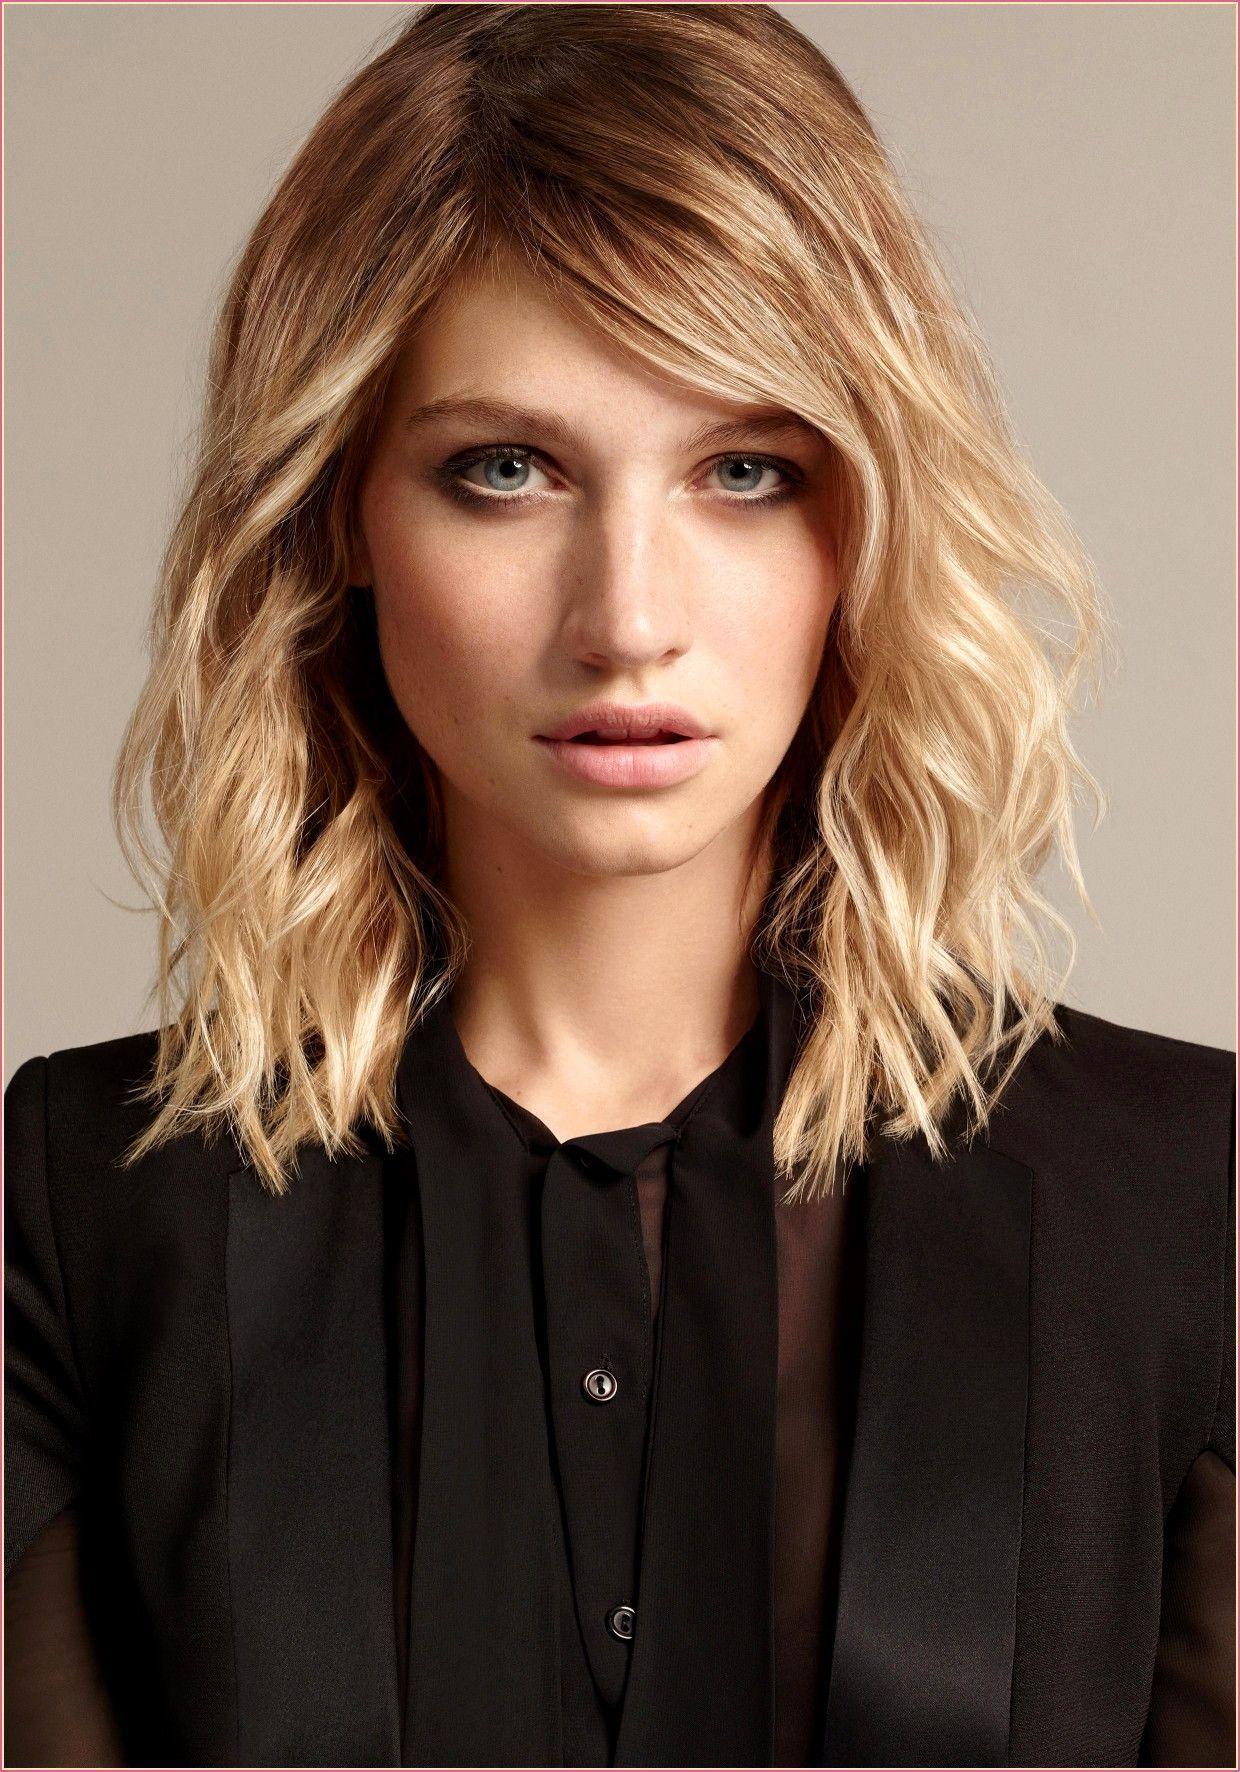 Trendfrisuren 2020 Frauen Mittellang Frauen Langhaarfrisurenfeineshaar Mittellang Trend In 2020 Trendfrisuren Mittellange Haare Frisuren Einfach Langhaarfrisuren